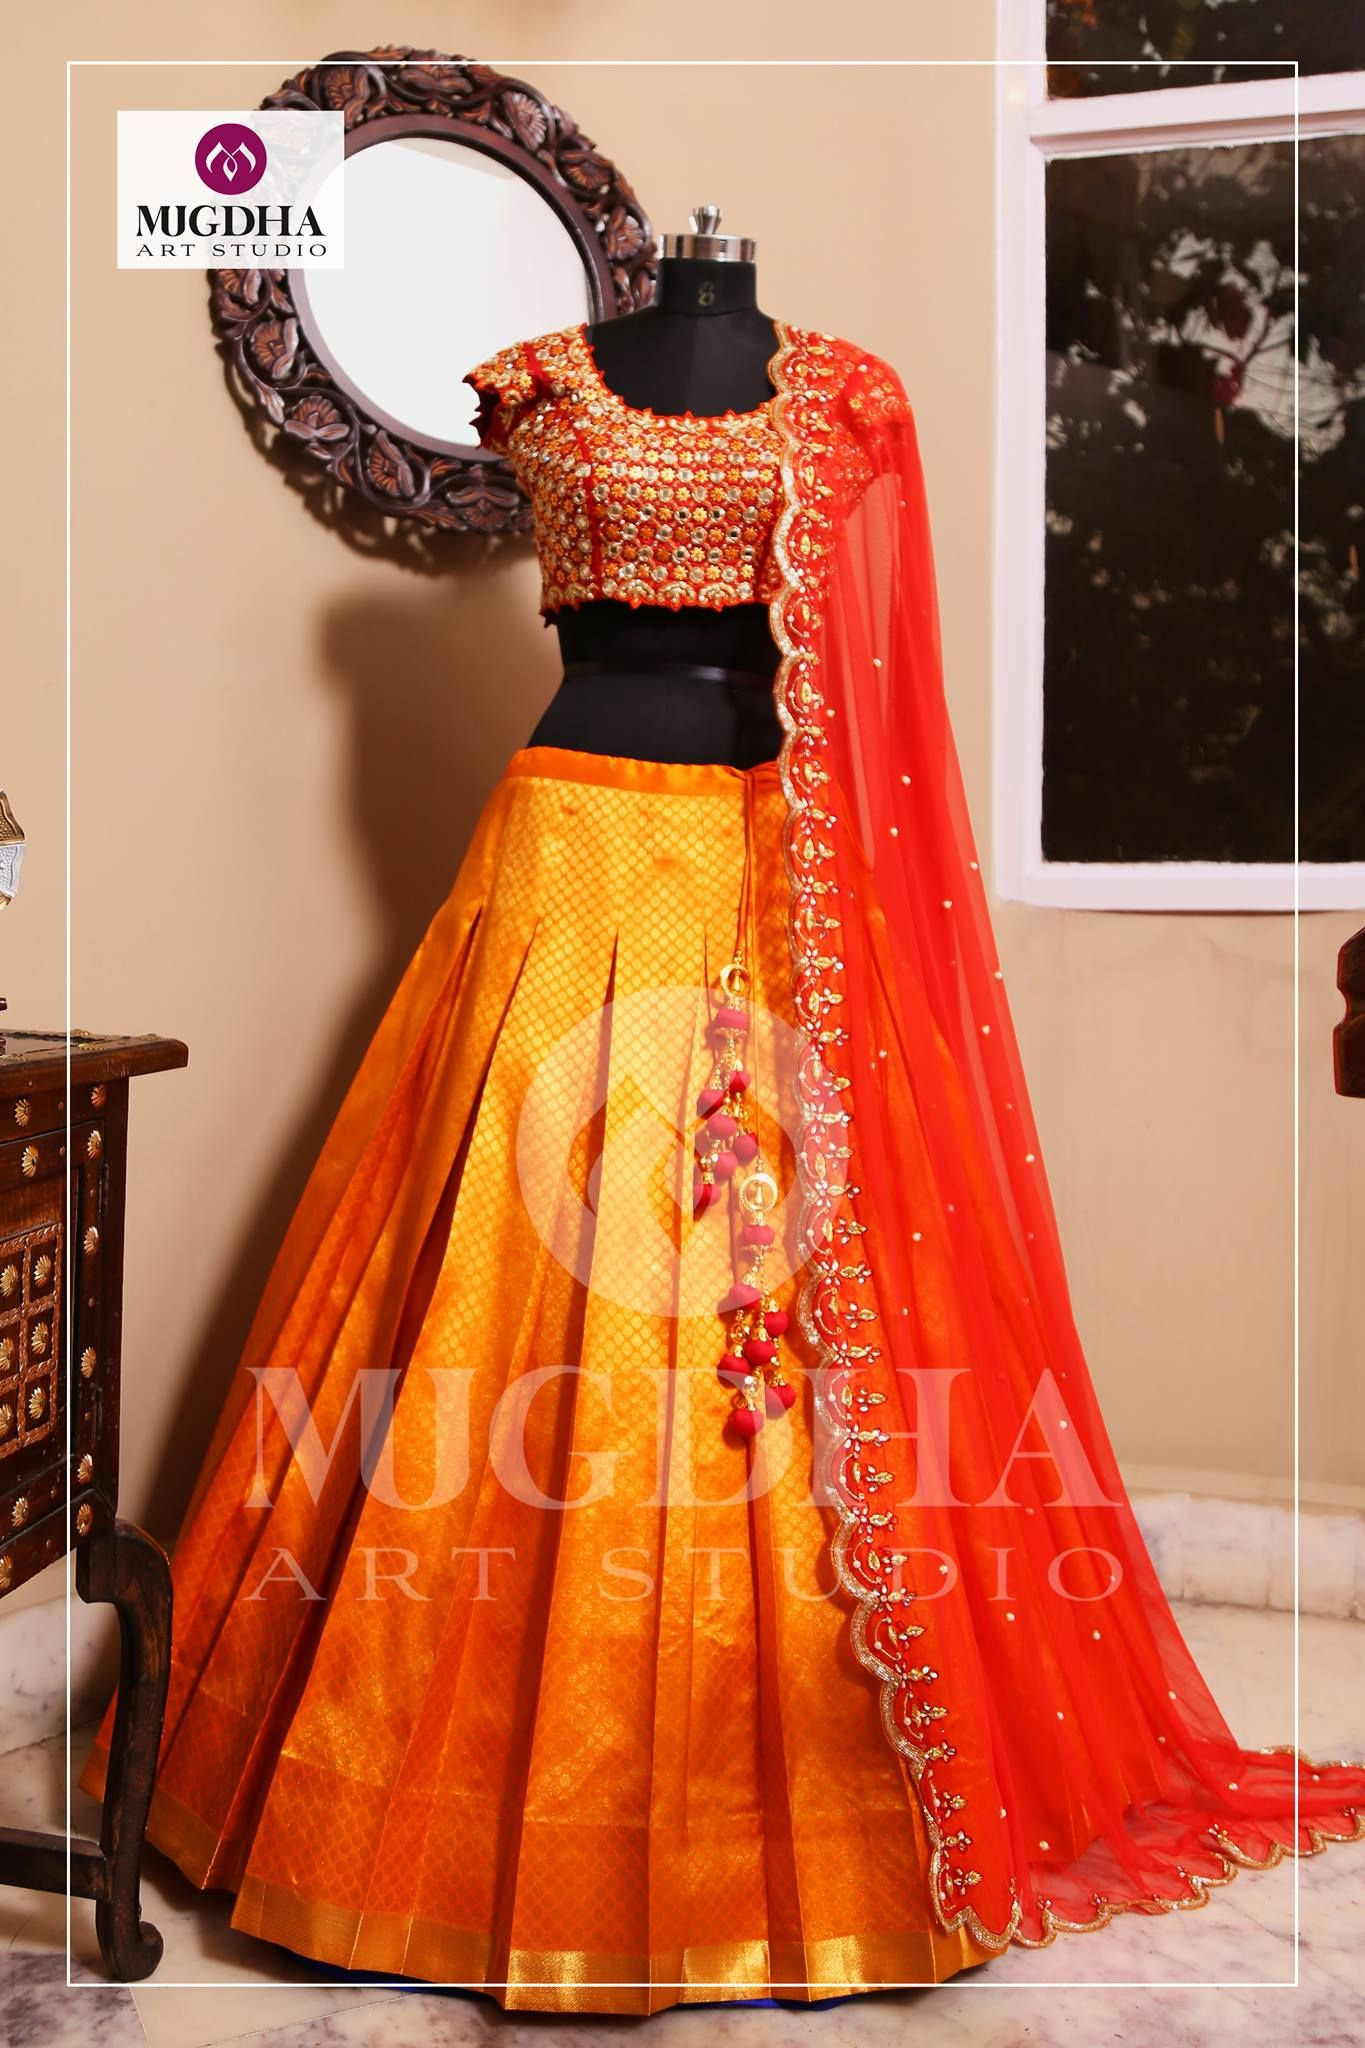 8a05edee024ca6 Kanchi Pattu Lehenga with Creative HandMade Design from Mugdha Art  Studio.Product code : LHG